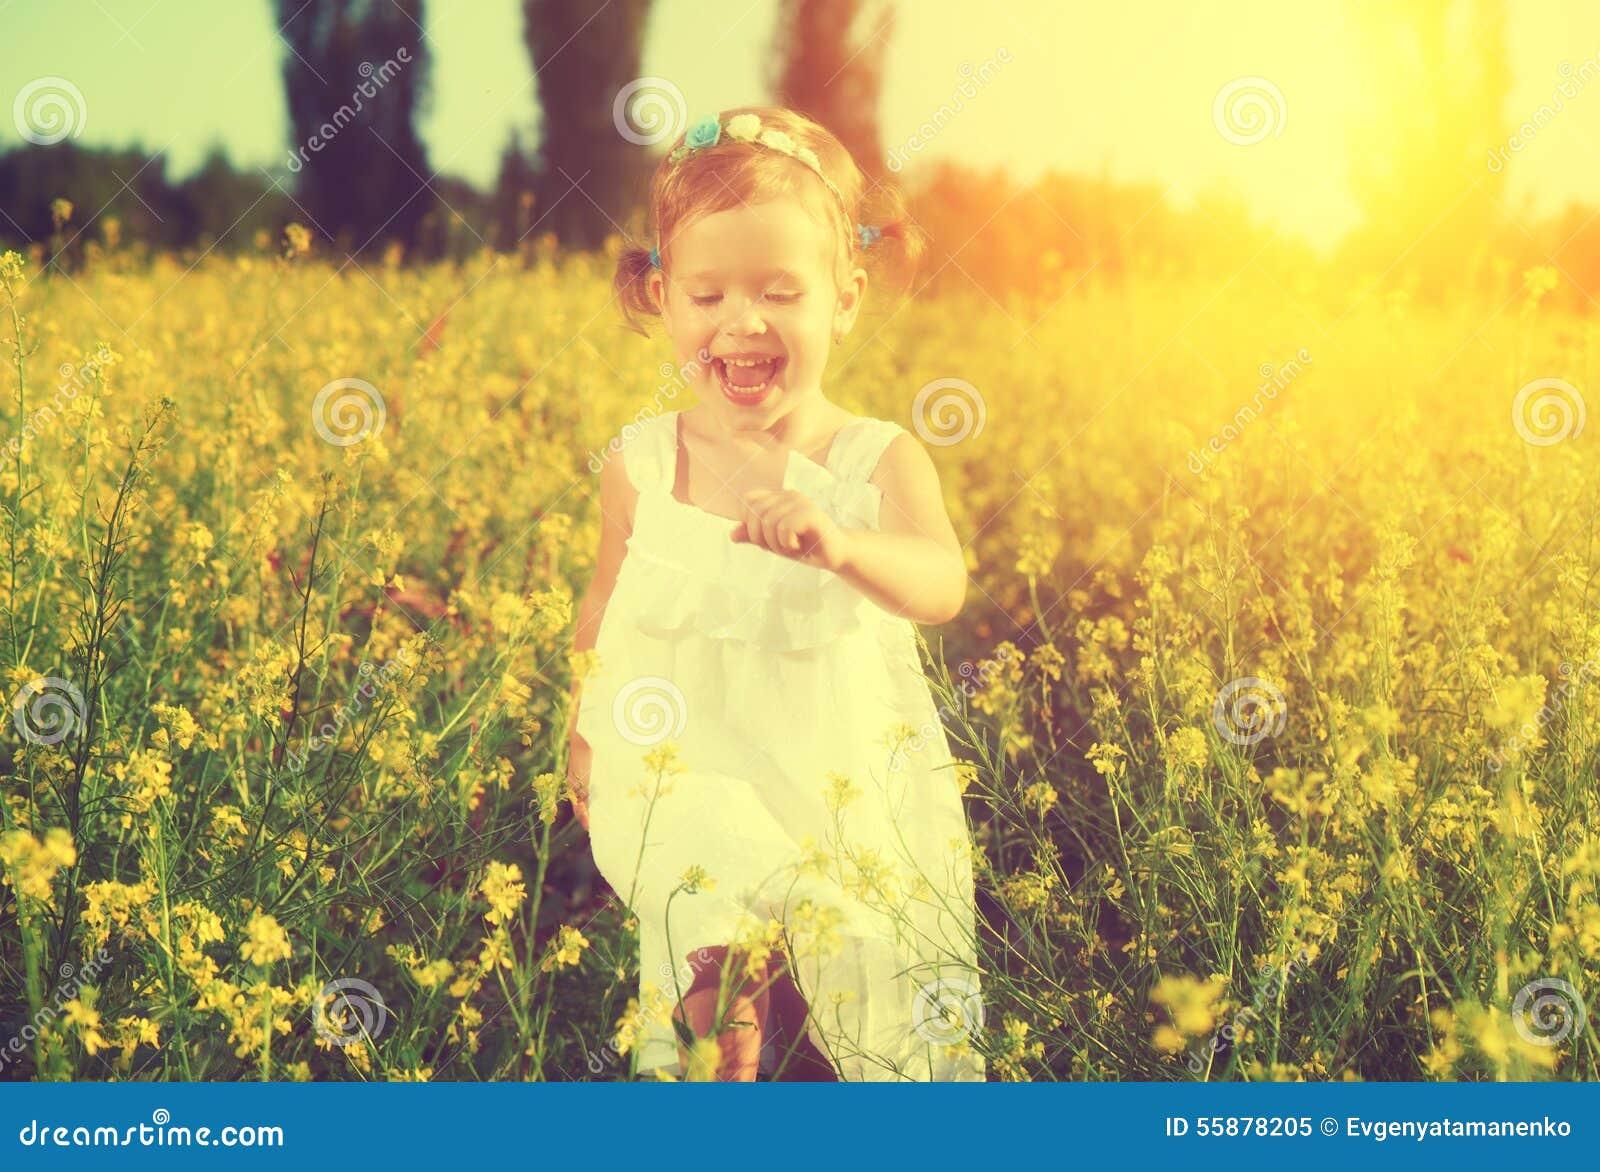 Children Nature Sunlight Blonde Depth Of Field White Dress: Happy Little Child Girl Running On Field With Yellow